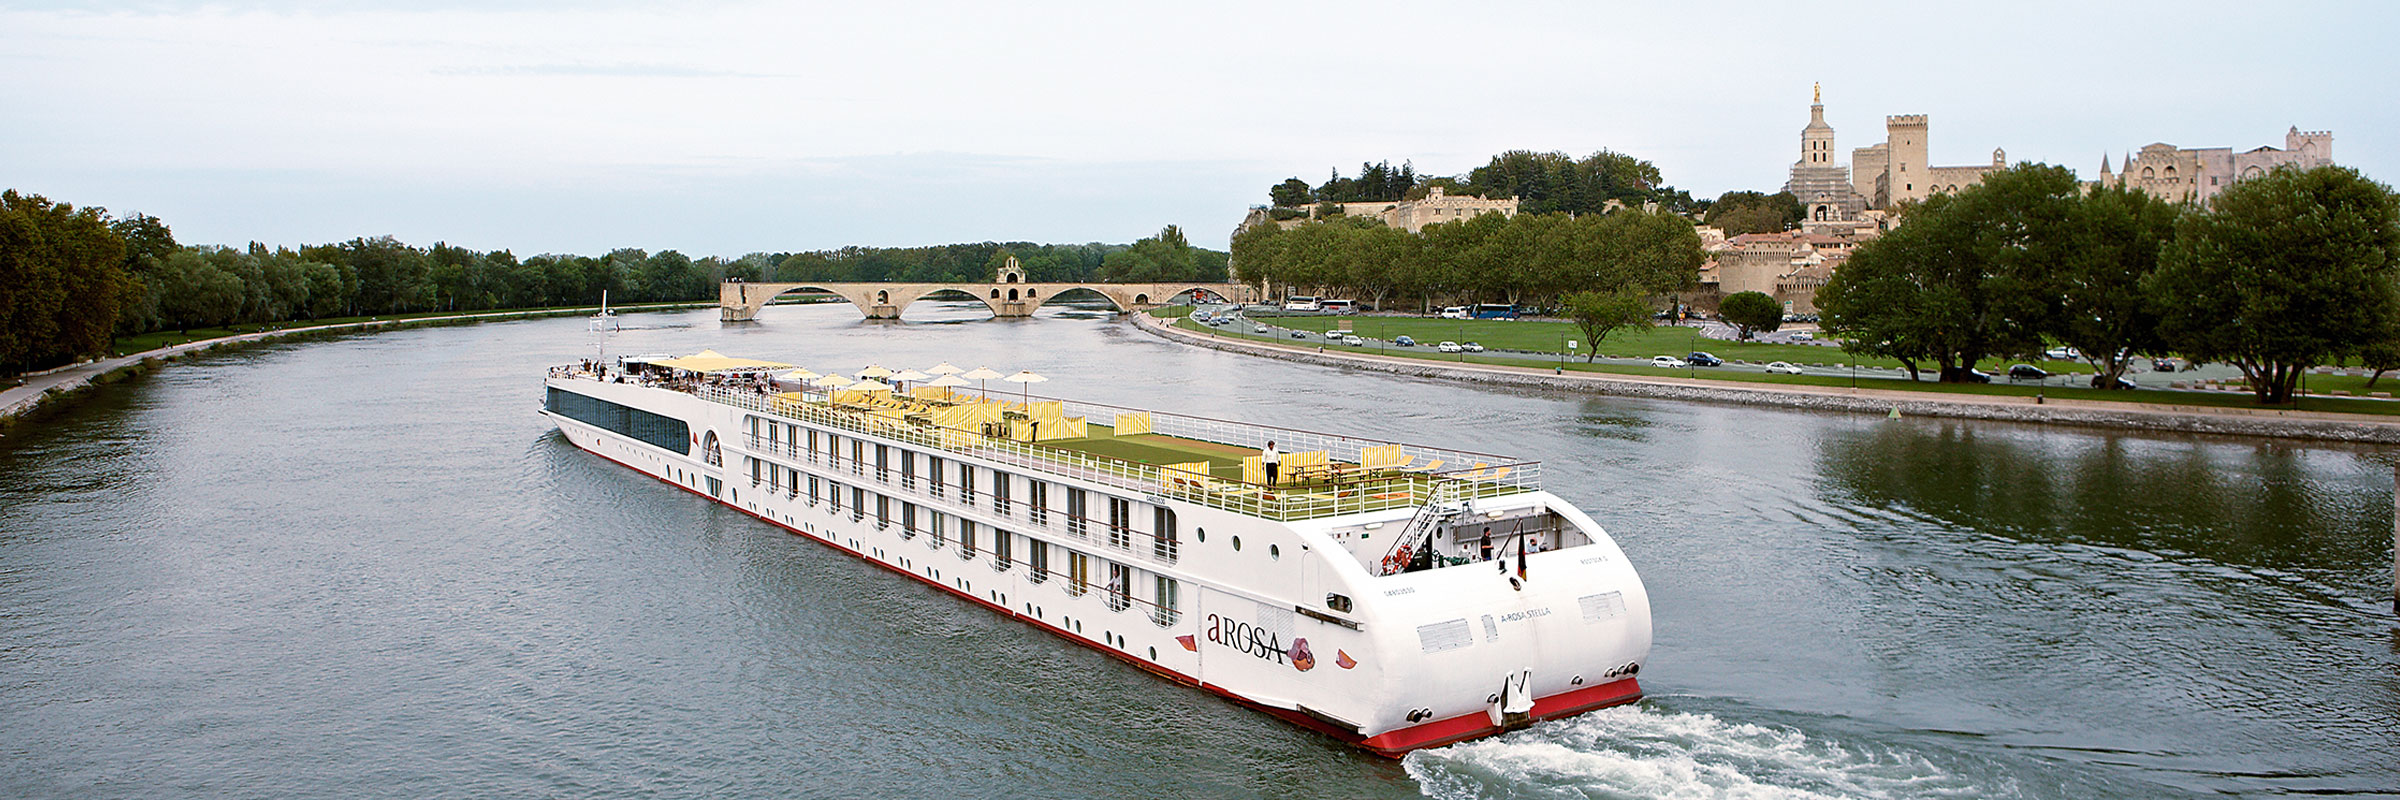 7 Nächte ab Lyon, Mâcon, Chalon-sur-Saône, Tournus, Viviers und Arles nach Avignon.